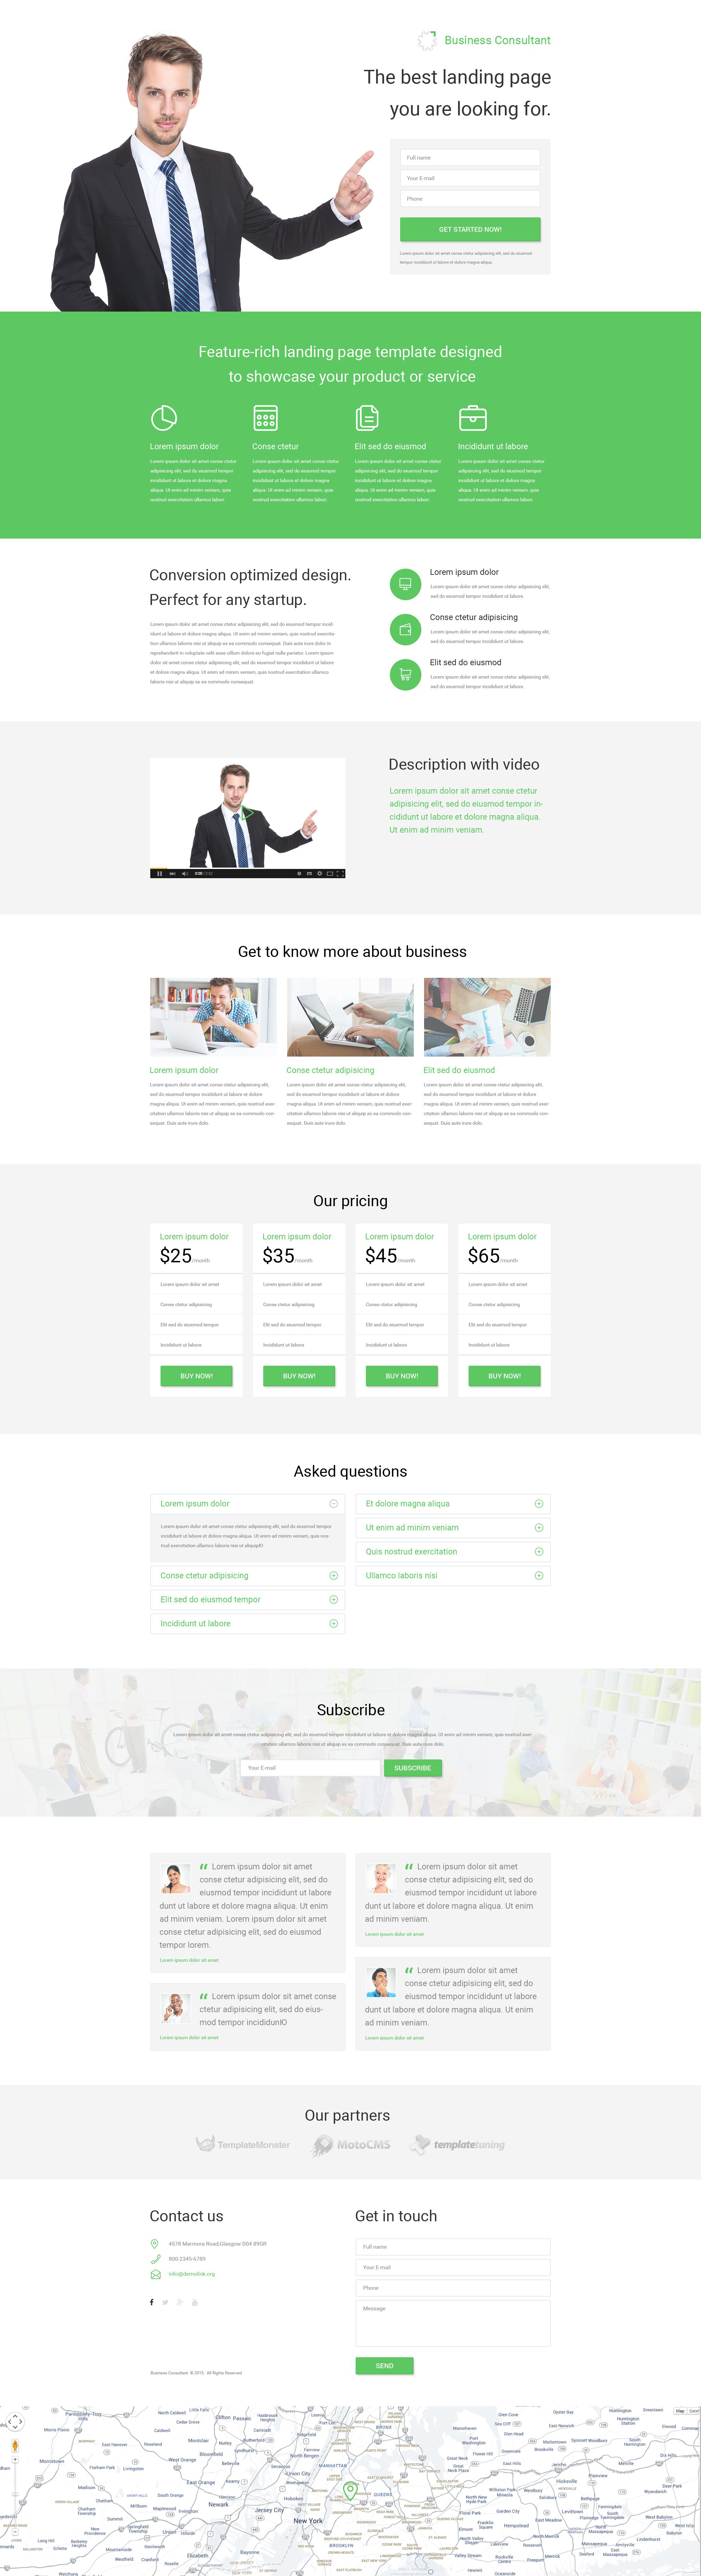 business responsive landing page template 53788. Black Bedroom Furniture Sets. Home Design Ideas